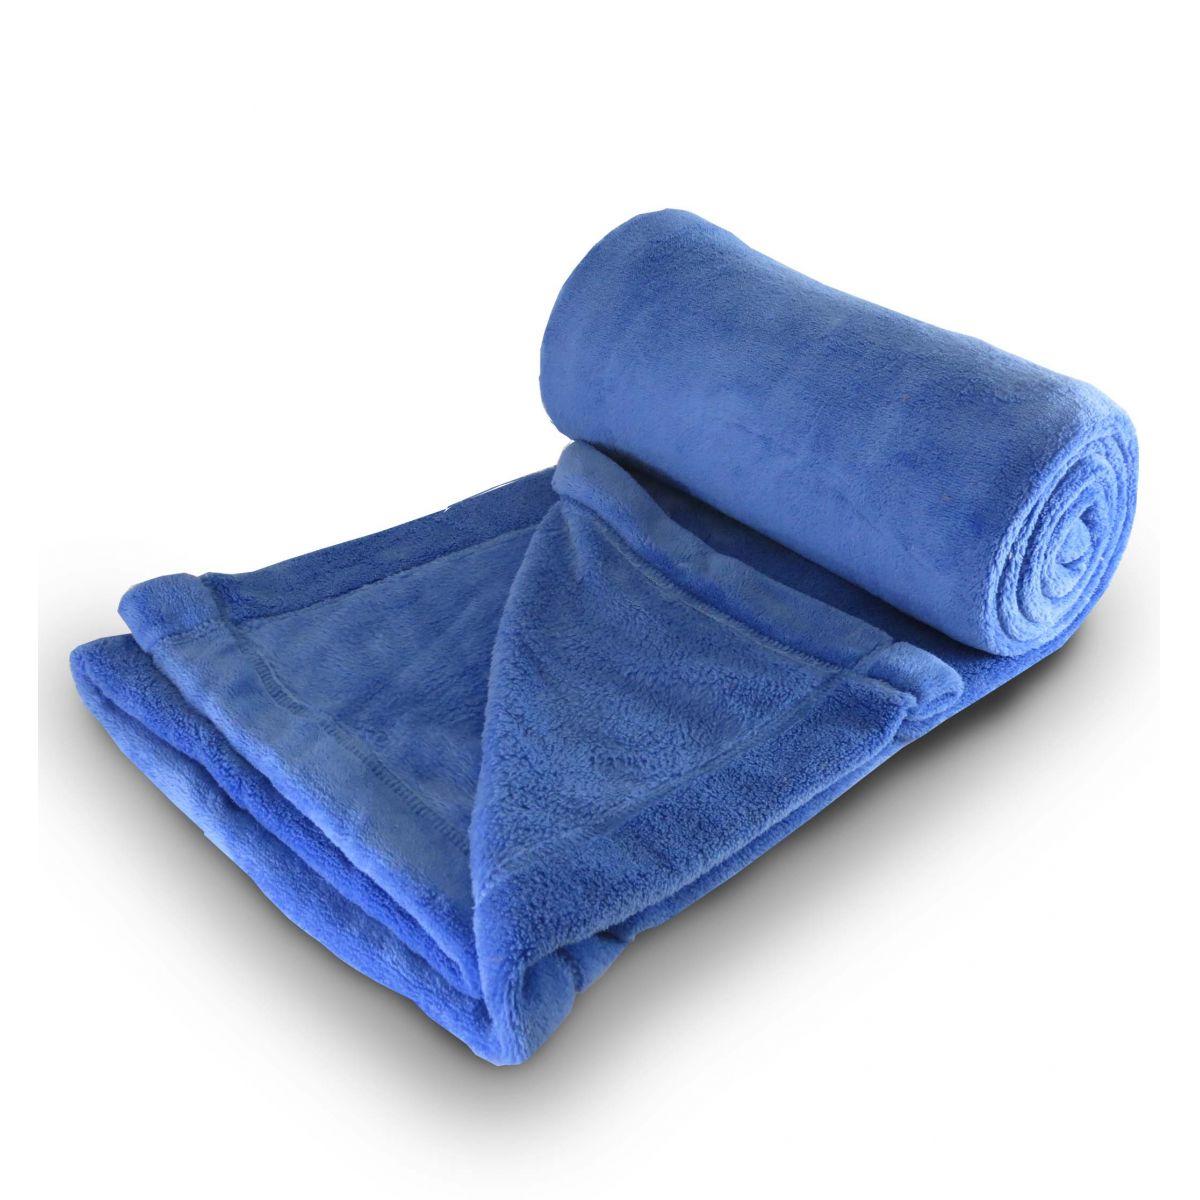 Cobertor de Microfibra Super King - Azul